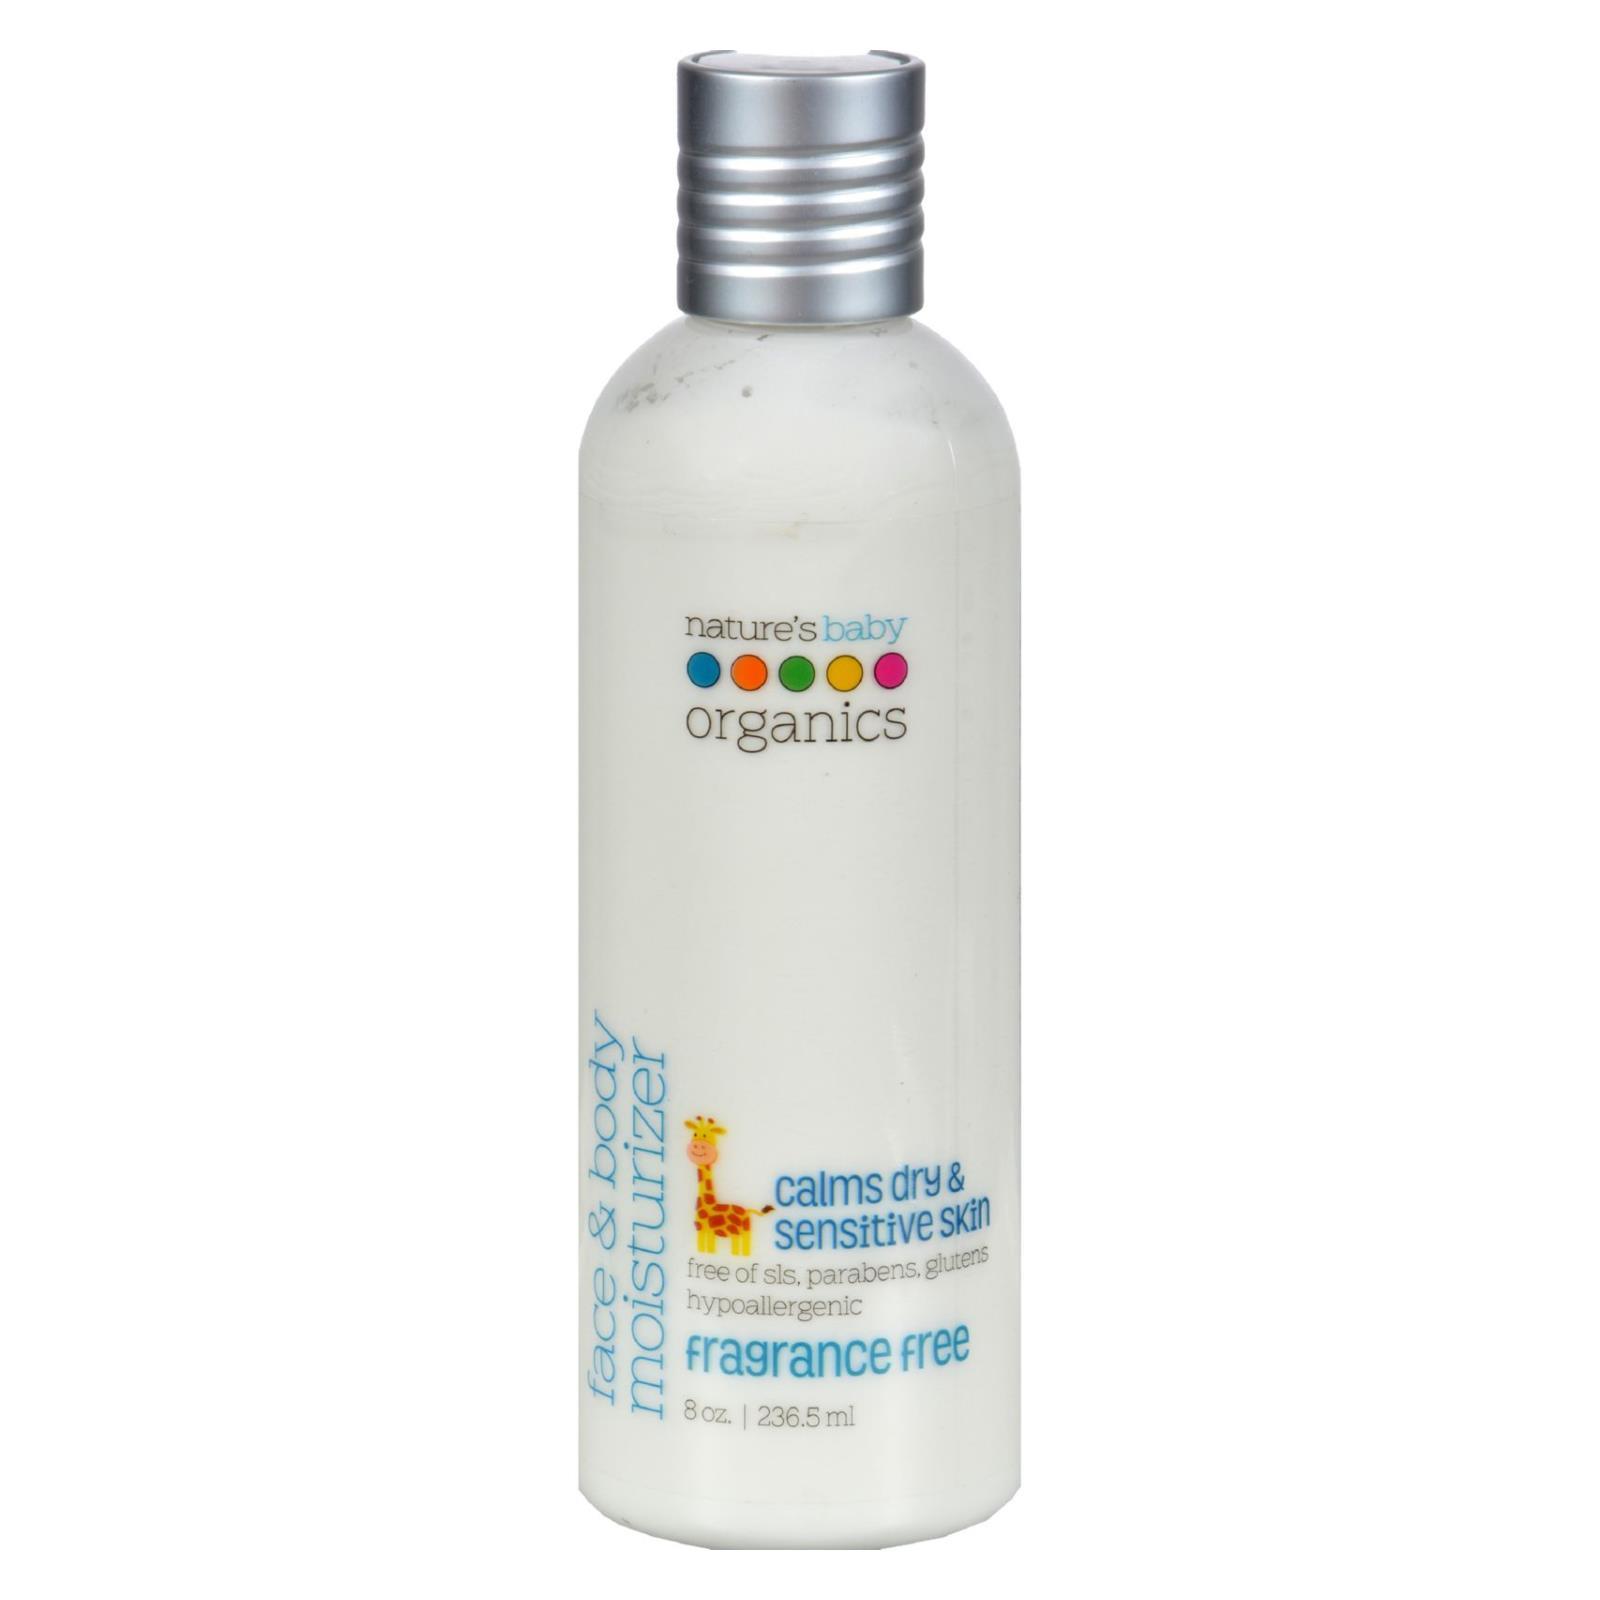 Nature's Baby Organics Face and Body Moisturizer Fragrance Free - 8 fl oz